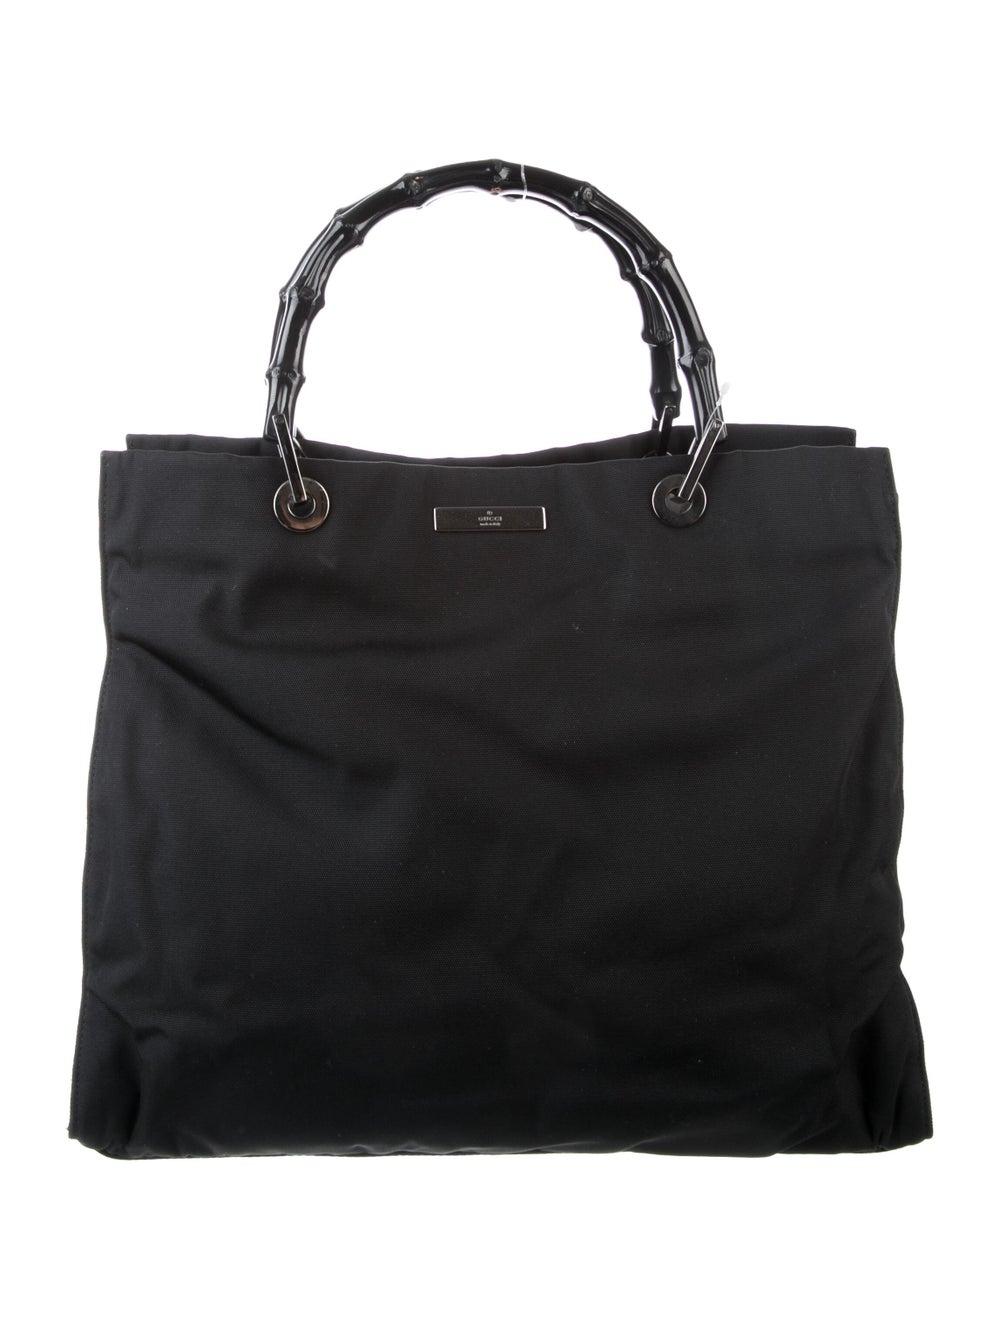 Gucci Vintage Nylon Bamboo Handle Bag Black - image 1